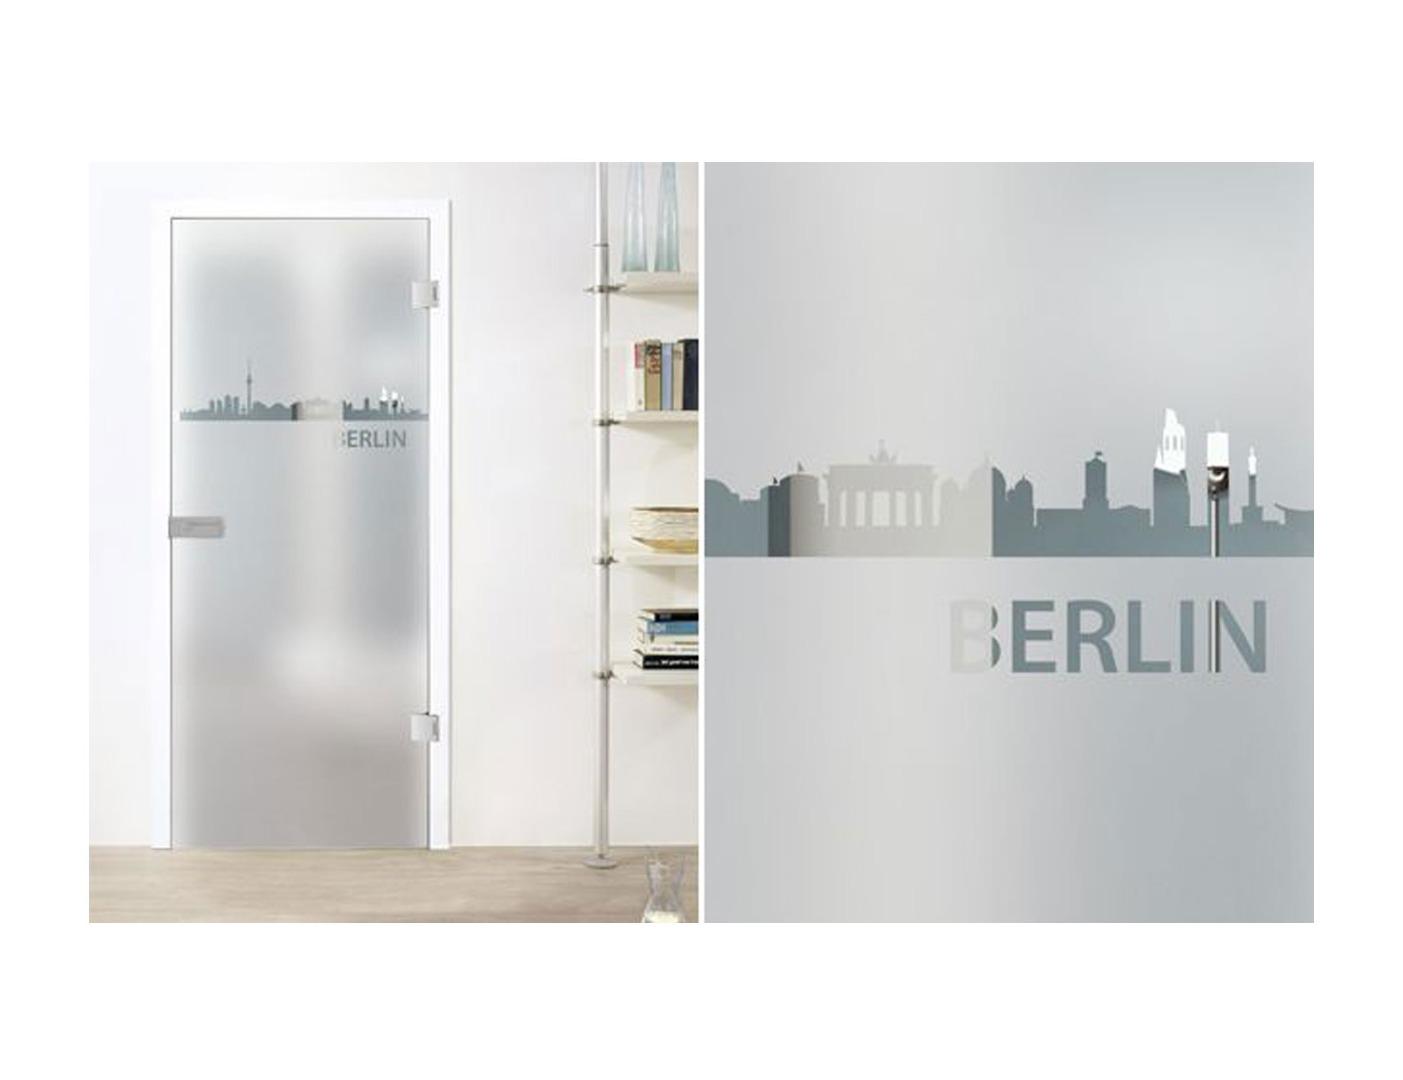 Frosted glass doors bespoke glass design internal doors berlin bespoke glass door design frosted glass doors planetlyrics Choice Image